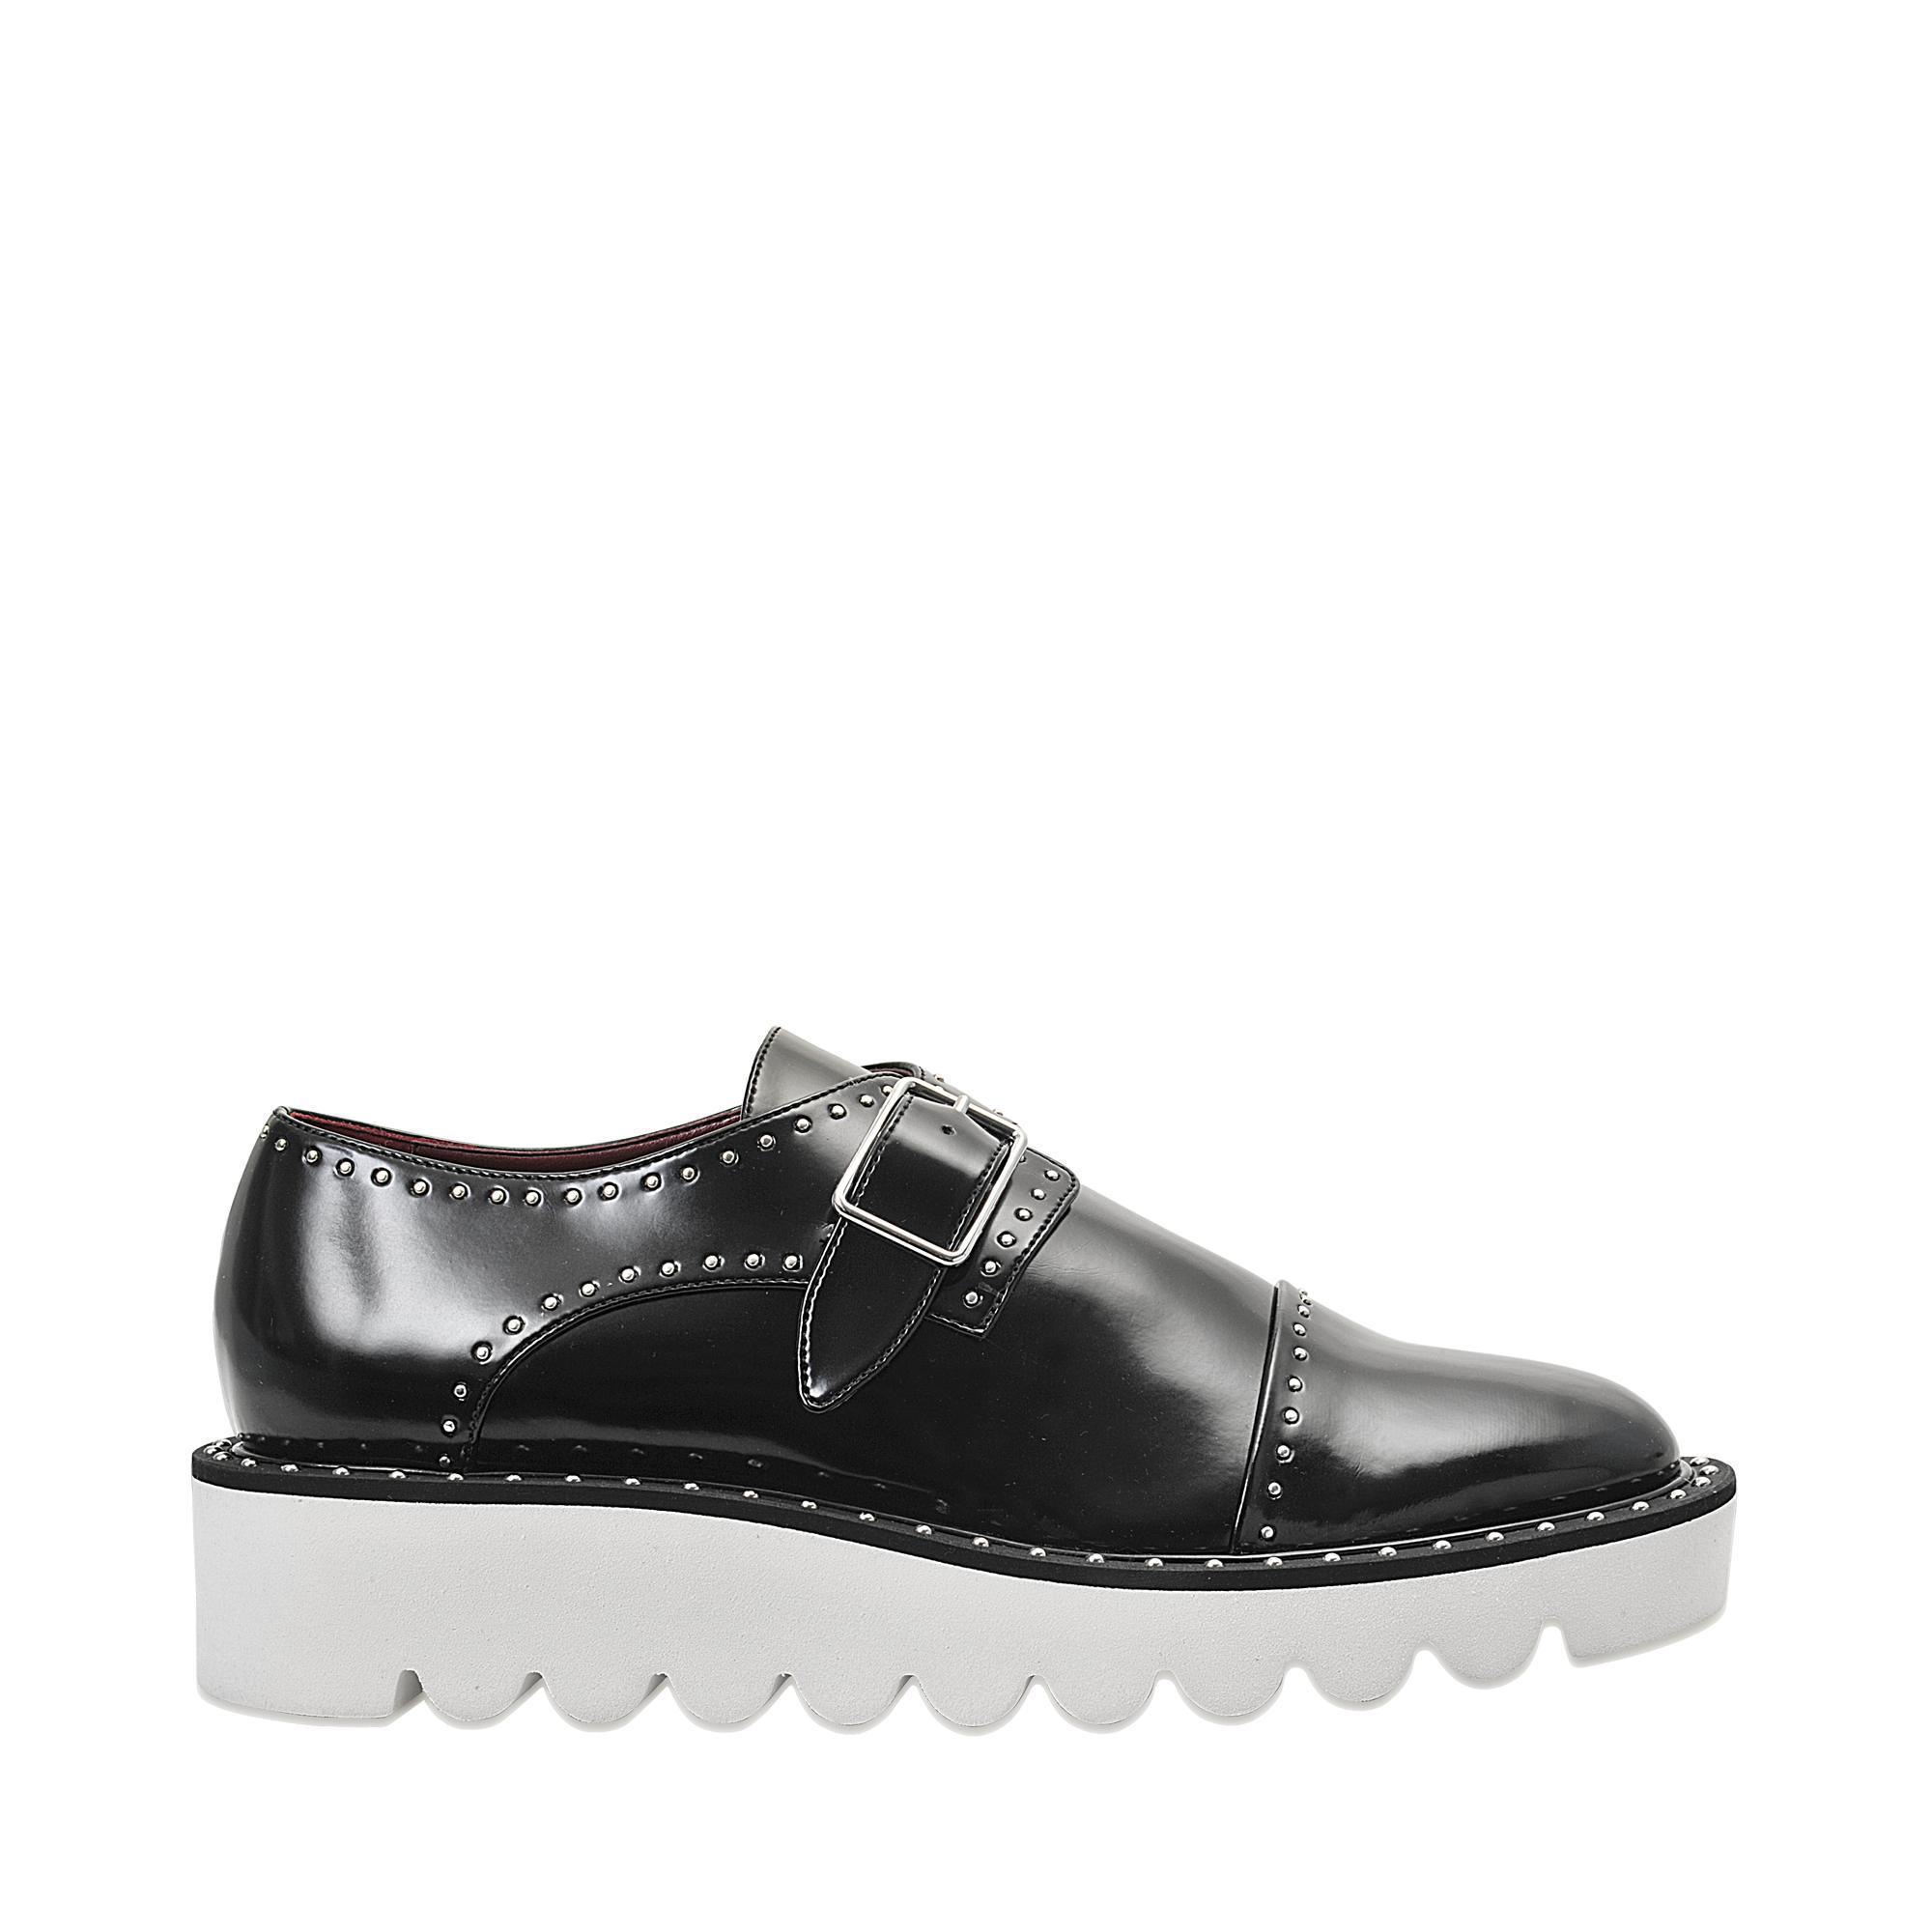 1d54a5699cb Lyst - Stella McCartney Odette Loafers in Black